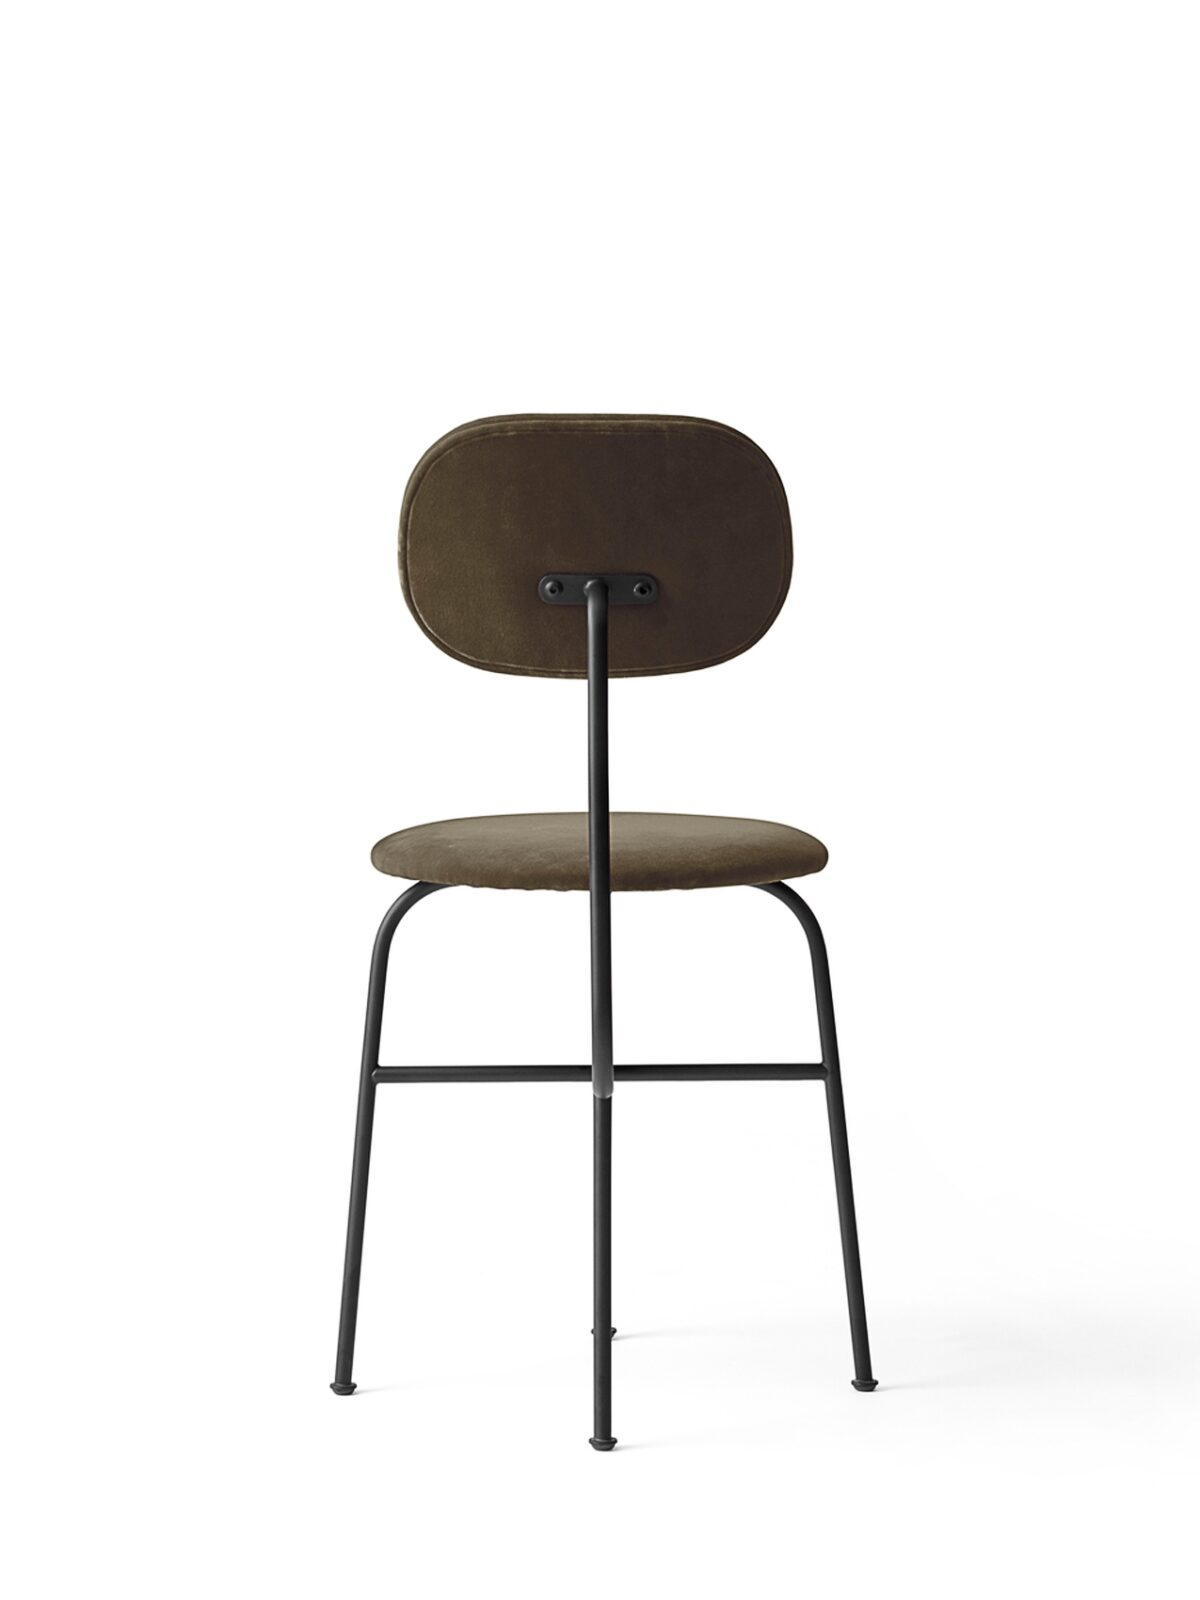 8465989 Afteroom Dining Chair Plus CityVelvetCA7832 078 Black Back